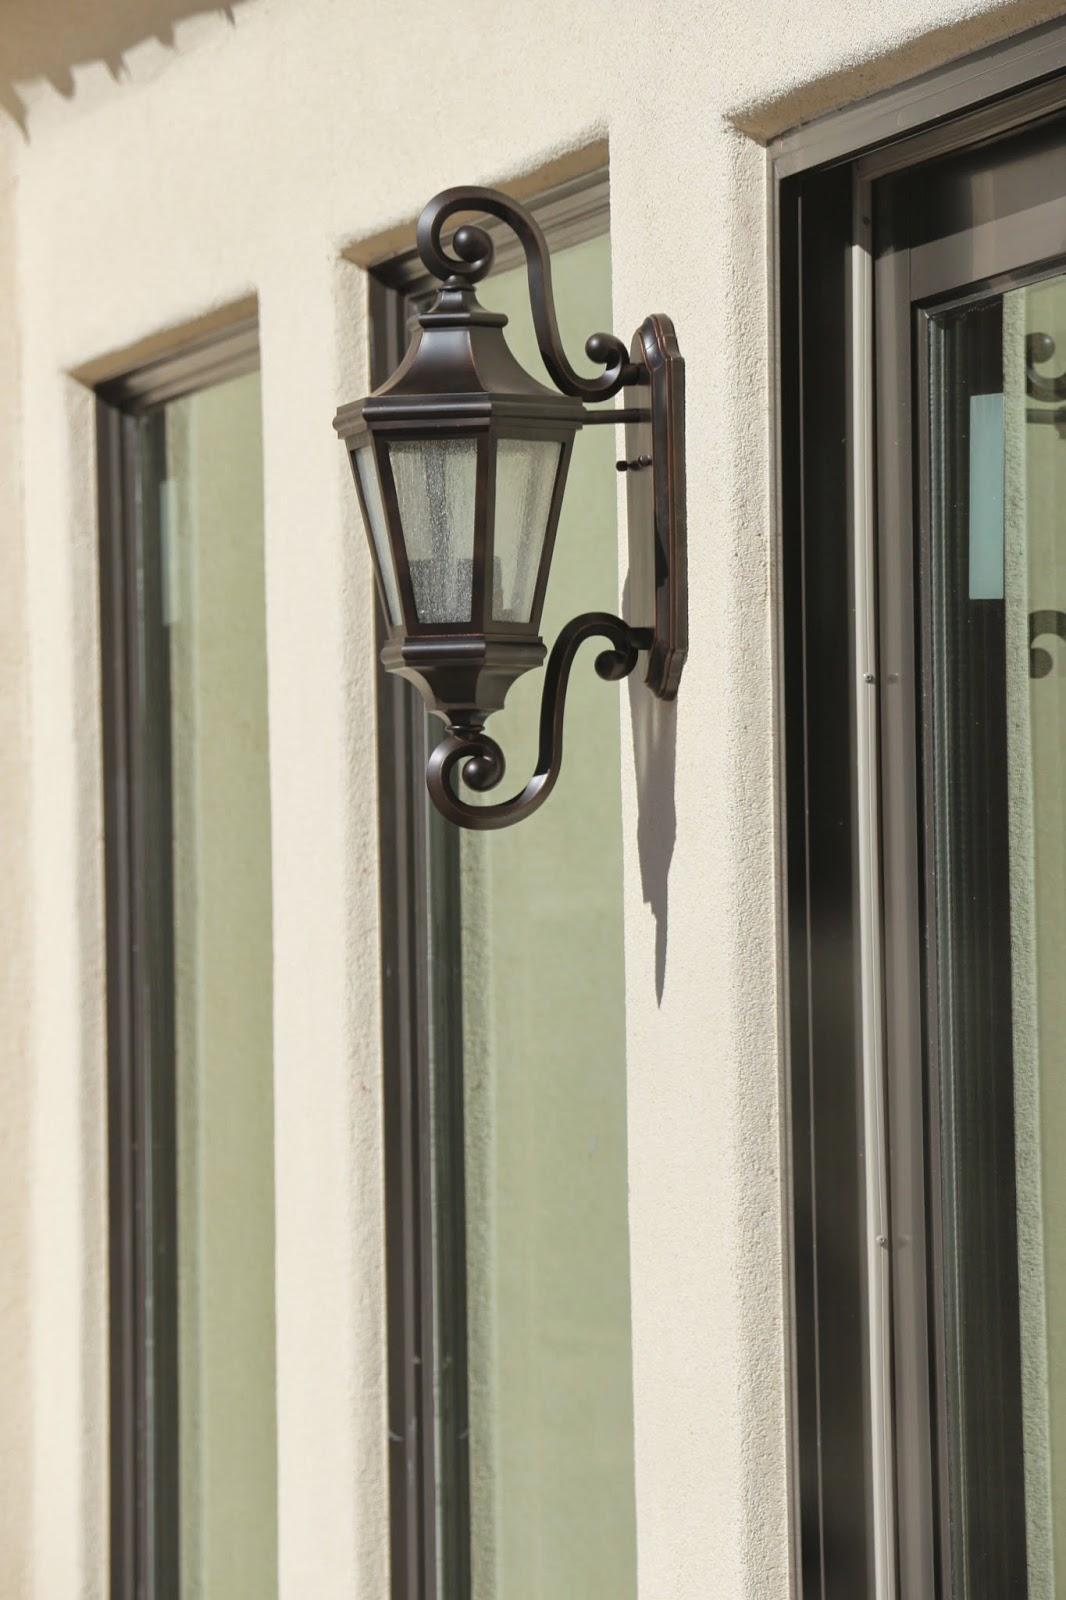 calvin crest wall light, spanish colonial wall light